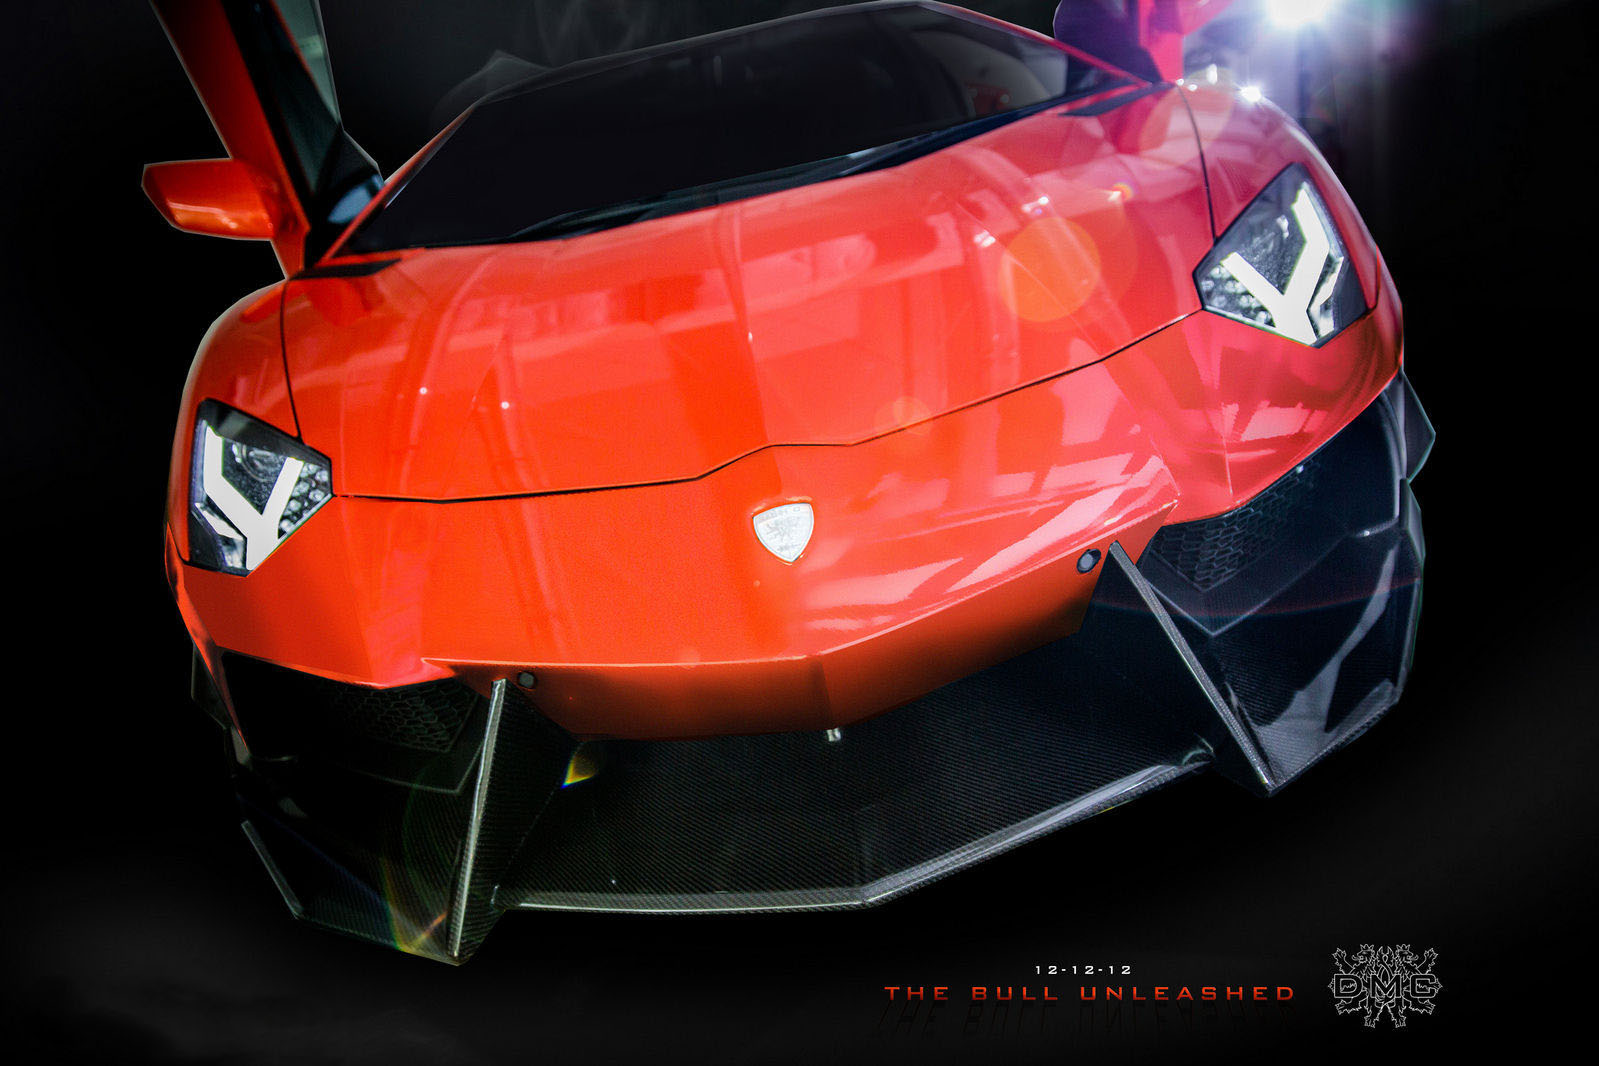 a car Lamborghini Aventador LP900 SV Limited Edition by DMC Tuning